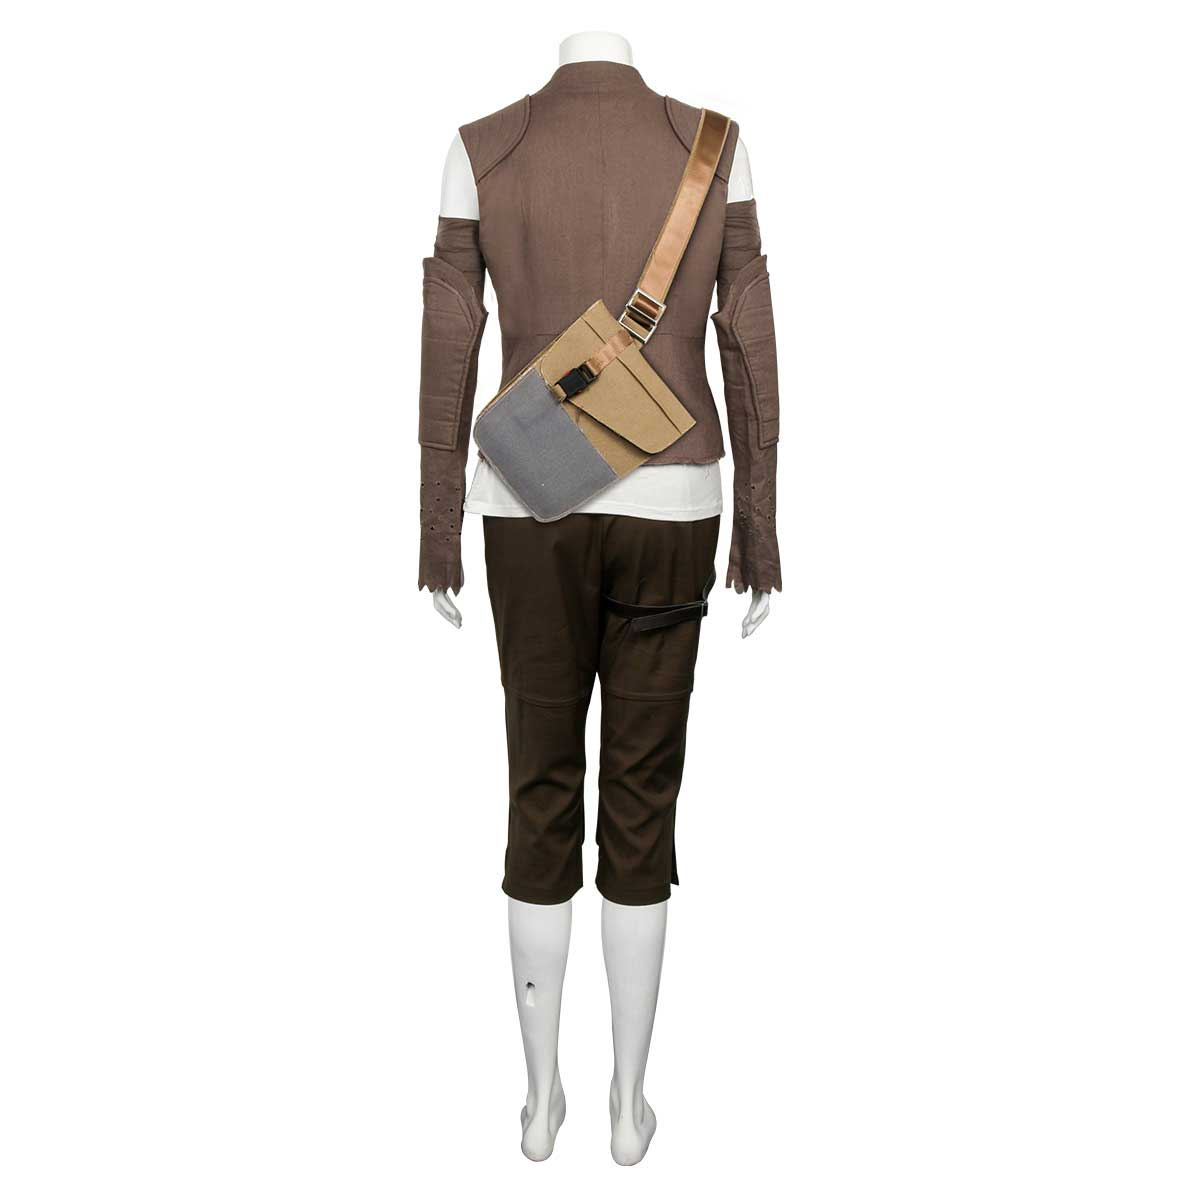 NEW The Last Jedi Luke Skywalker Uniform Outfit Cosplay Costume Custom Made